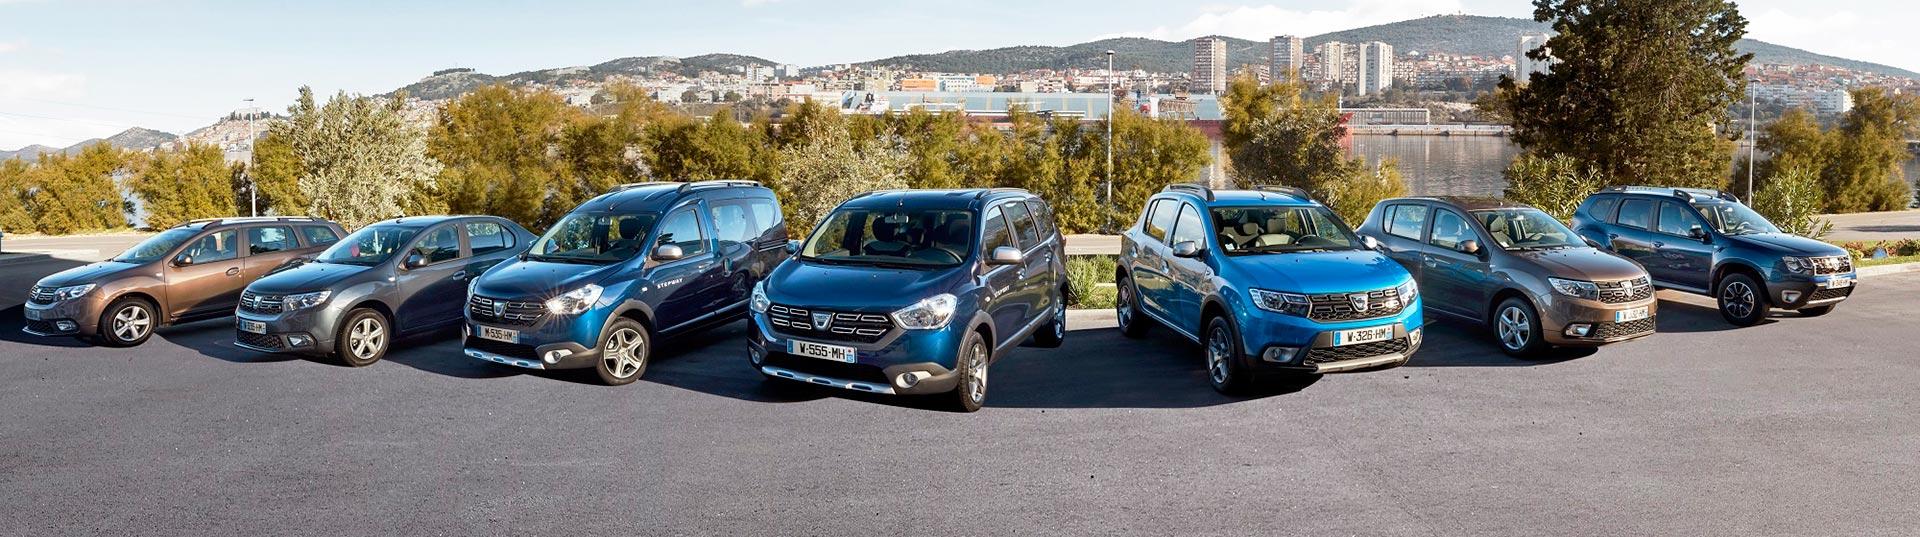 Nova gama Dacia